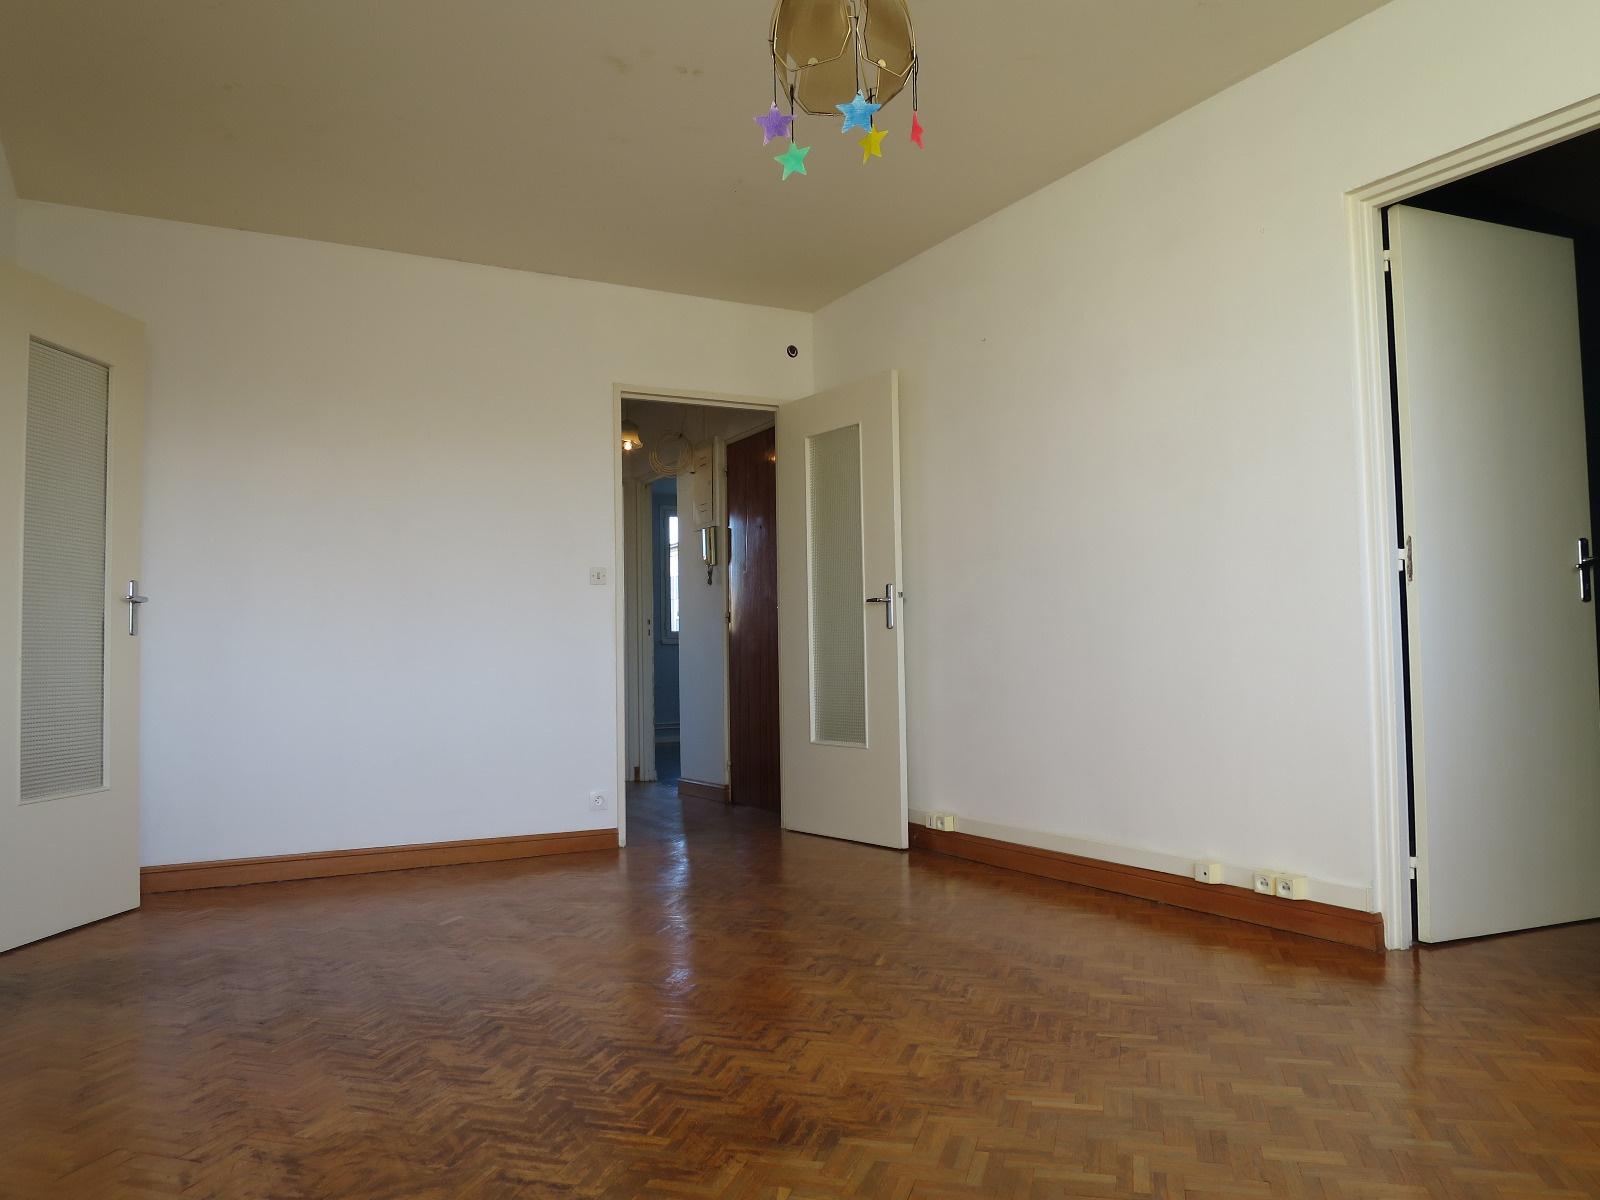 vente appartement de type 4 a renover. Black Bedroom Furniture Sets. Home Design Ideas